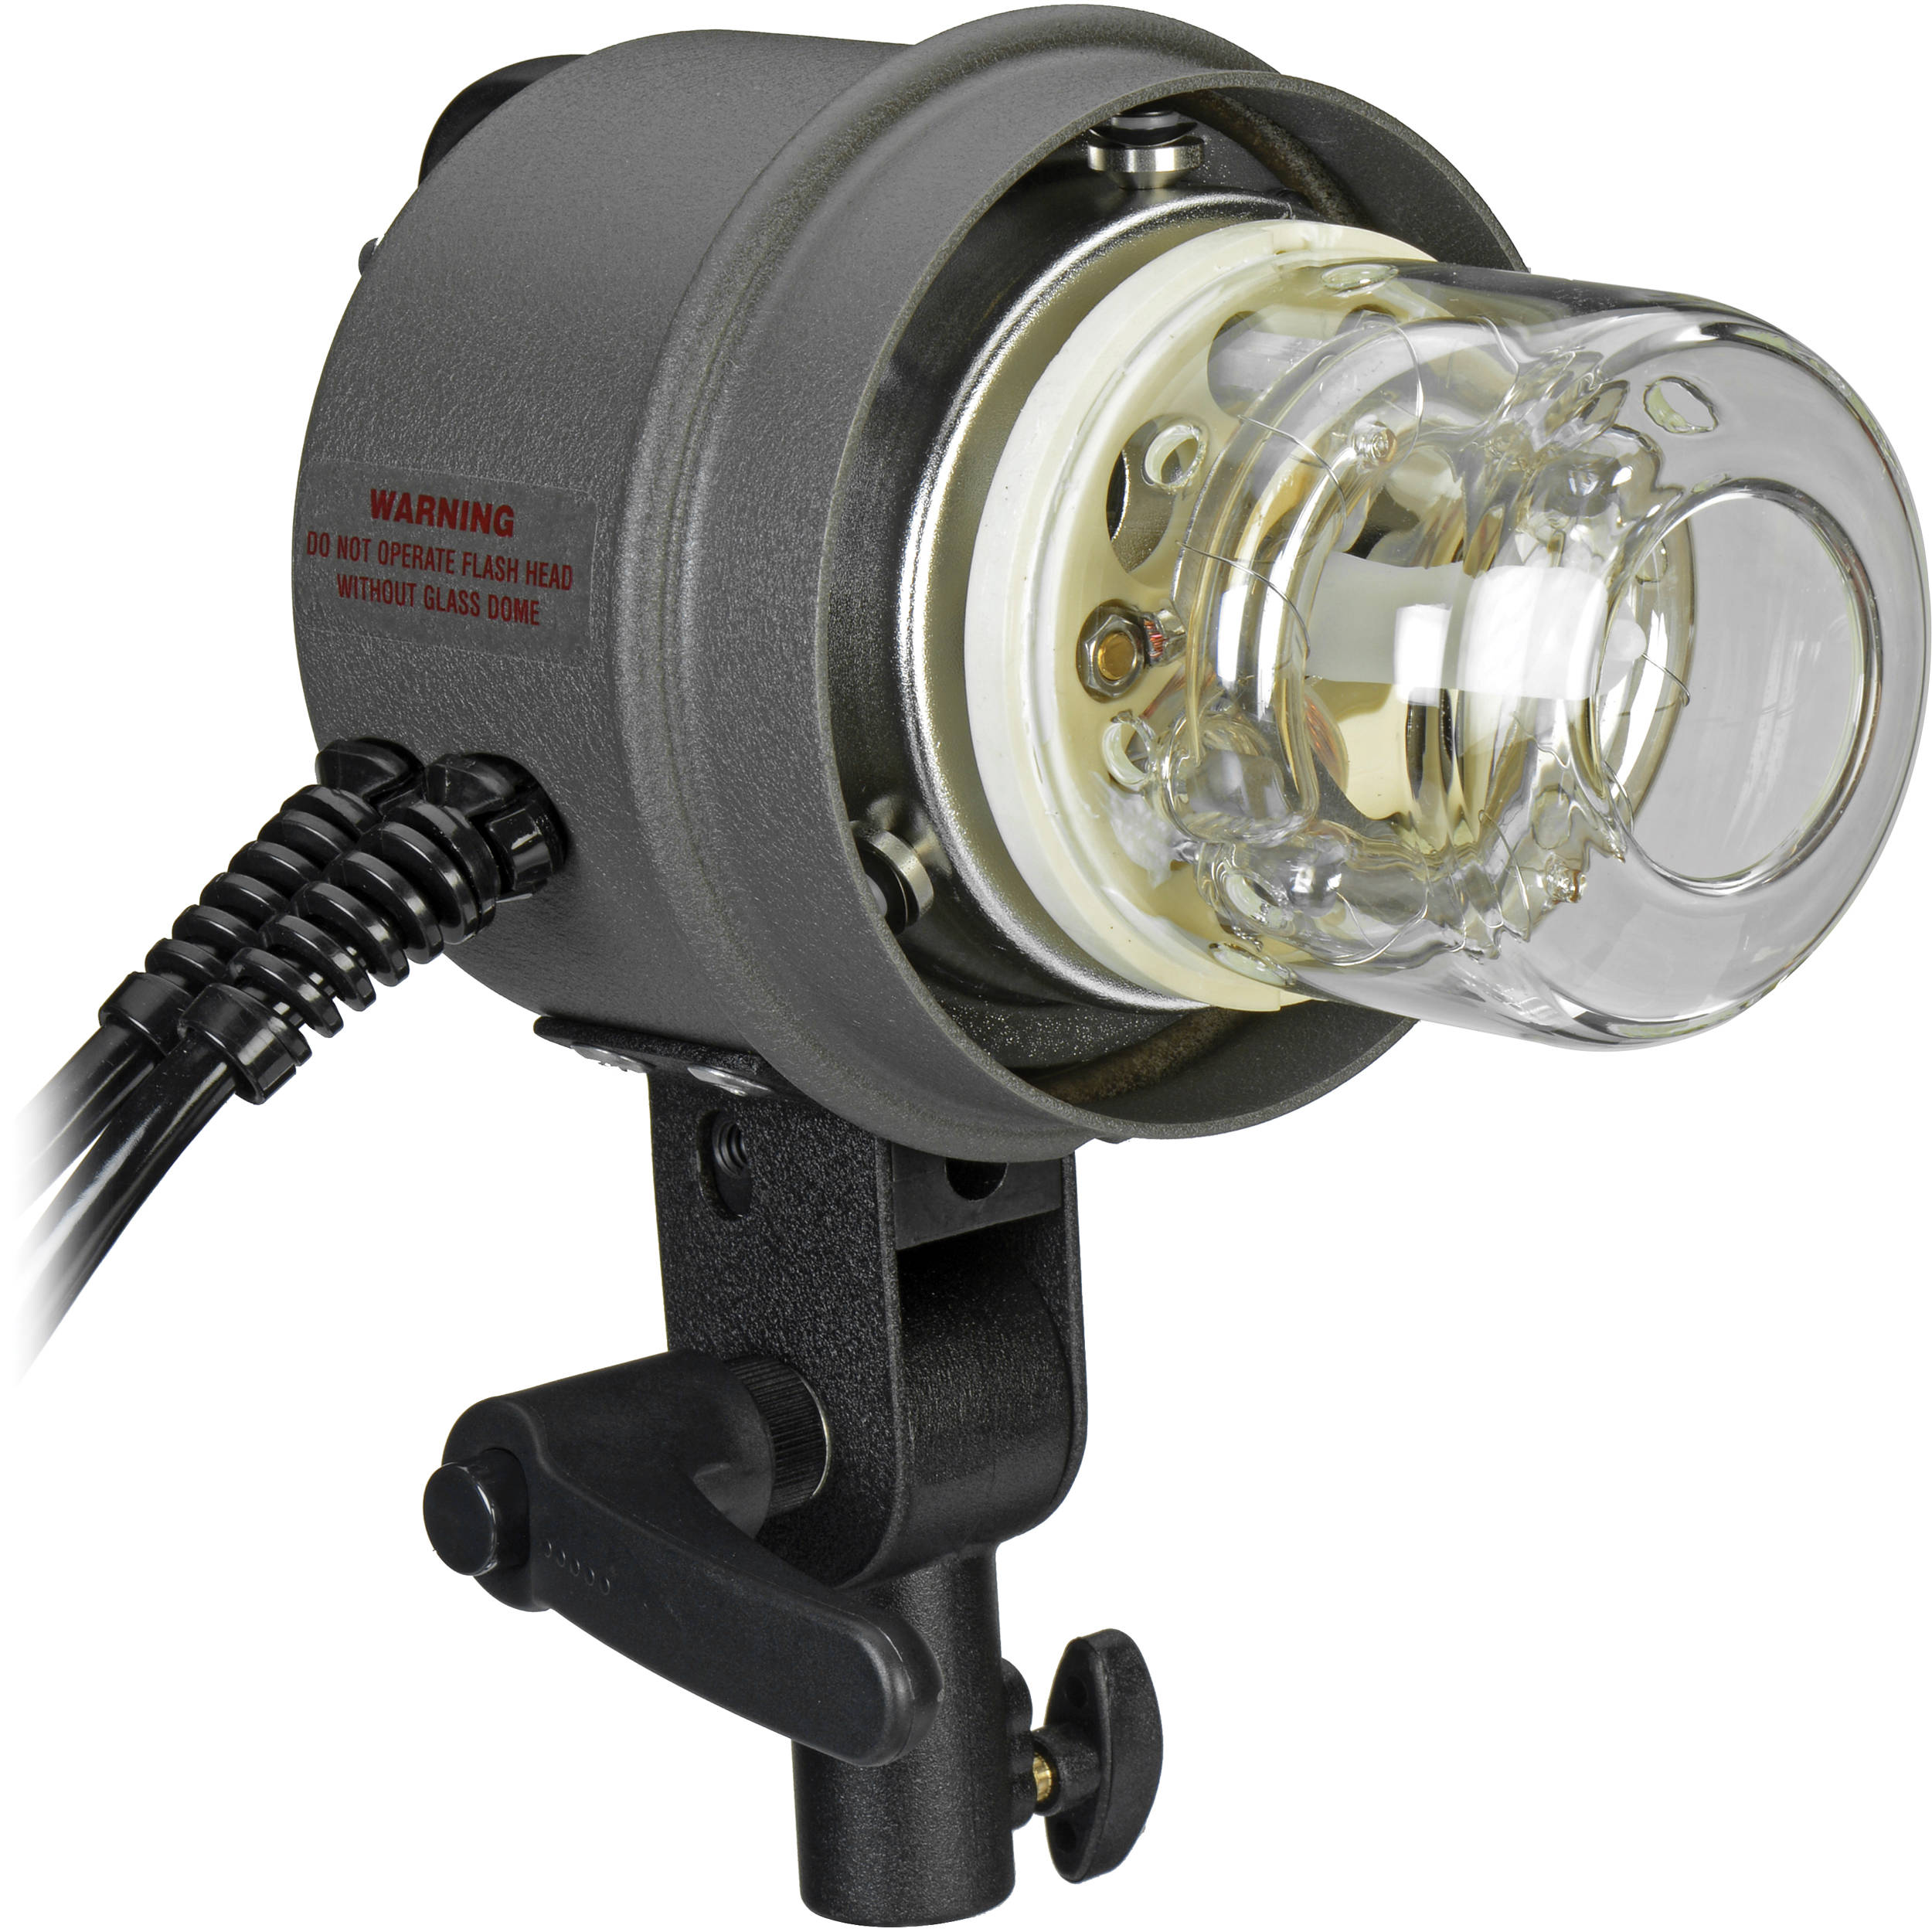 Arena Strobe Lights: Dynalite AH4000 Arena 4000 Watt/Second Flash Head AH-4000 B&H